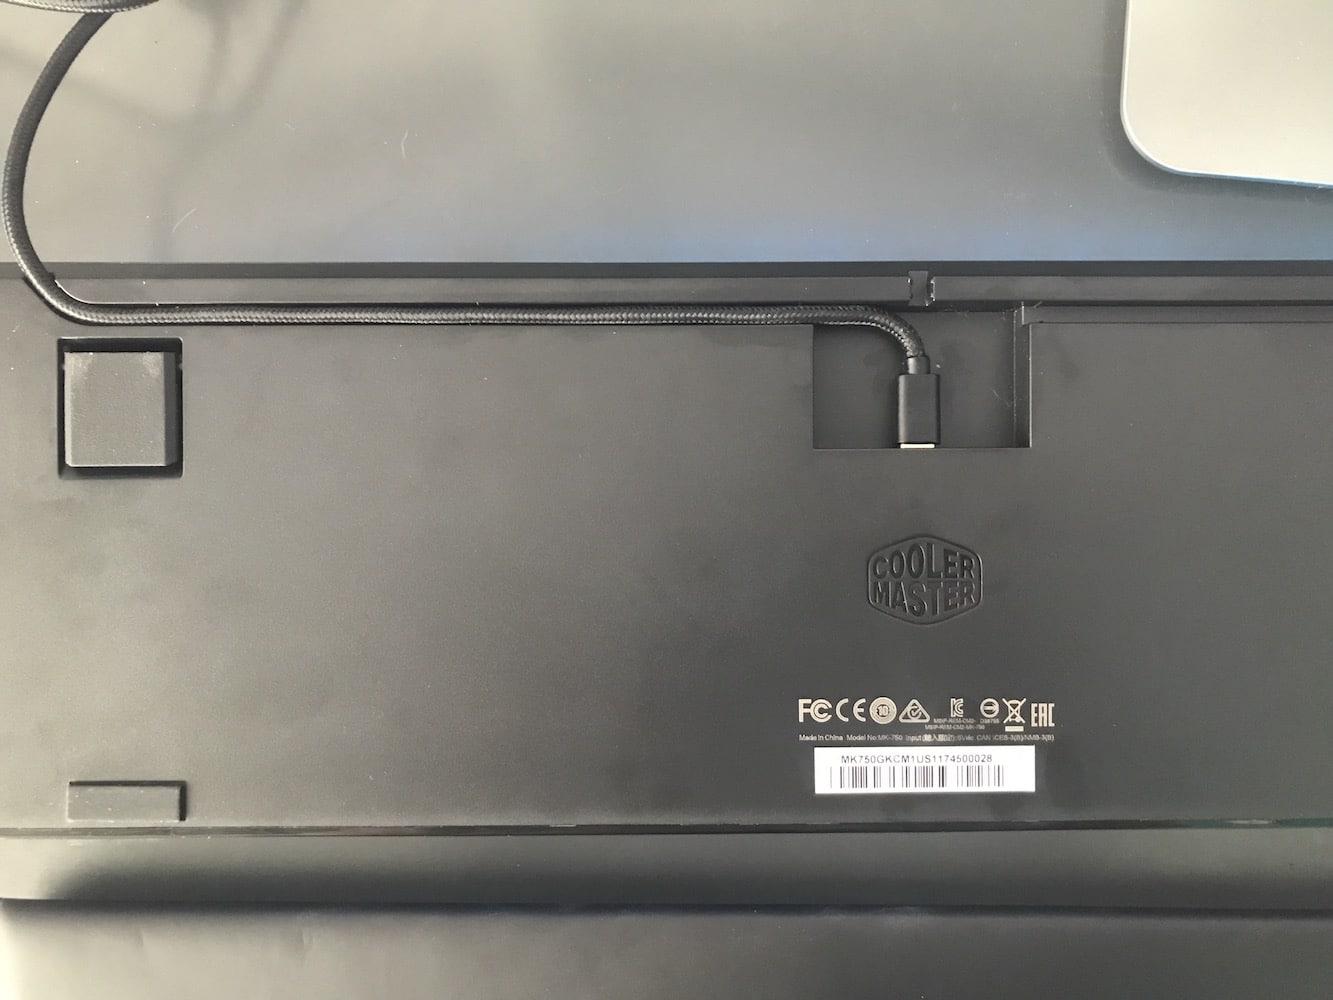 Cooler Master MasterKeys MK750 Mechanical Keyboard Review 9